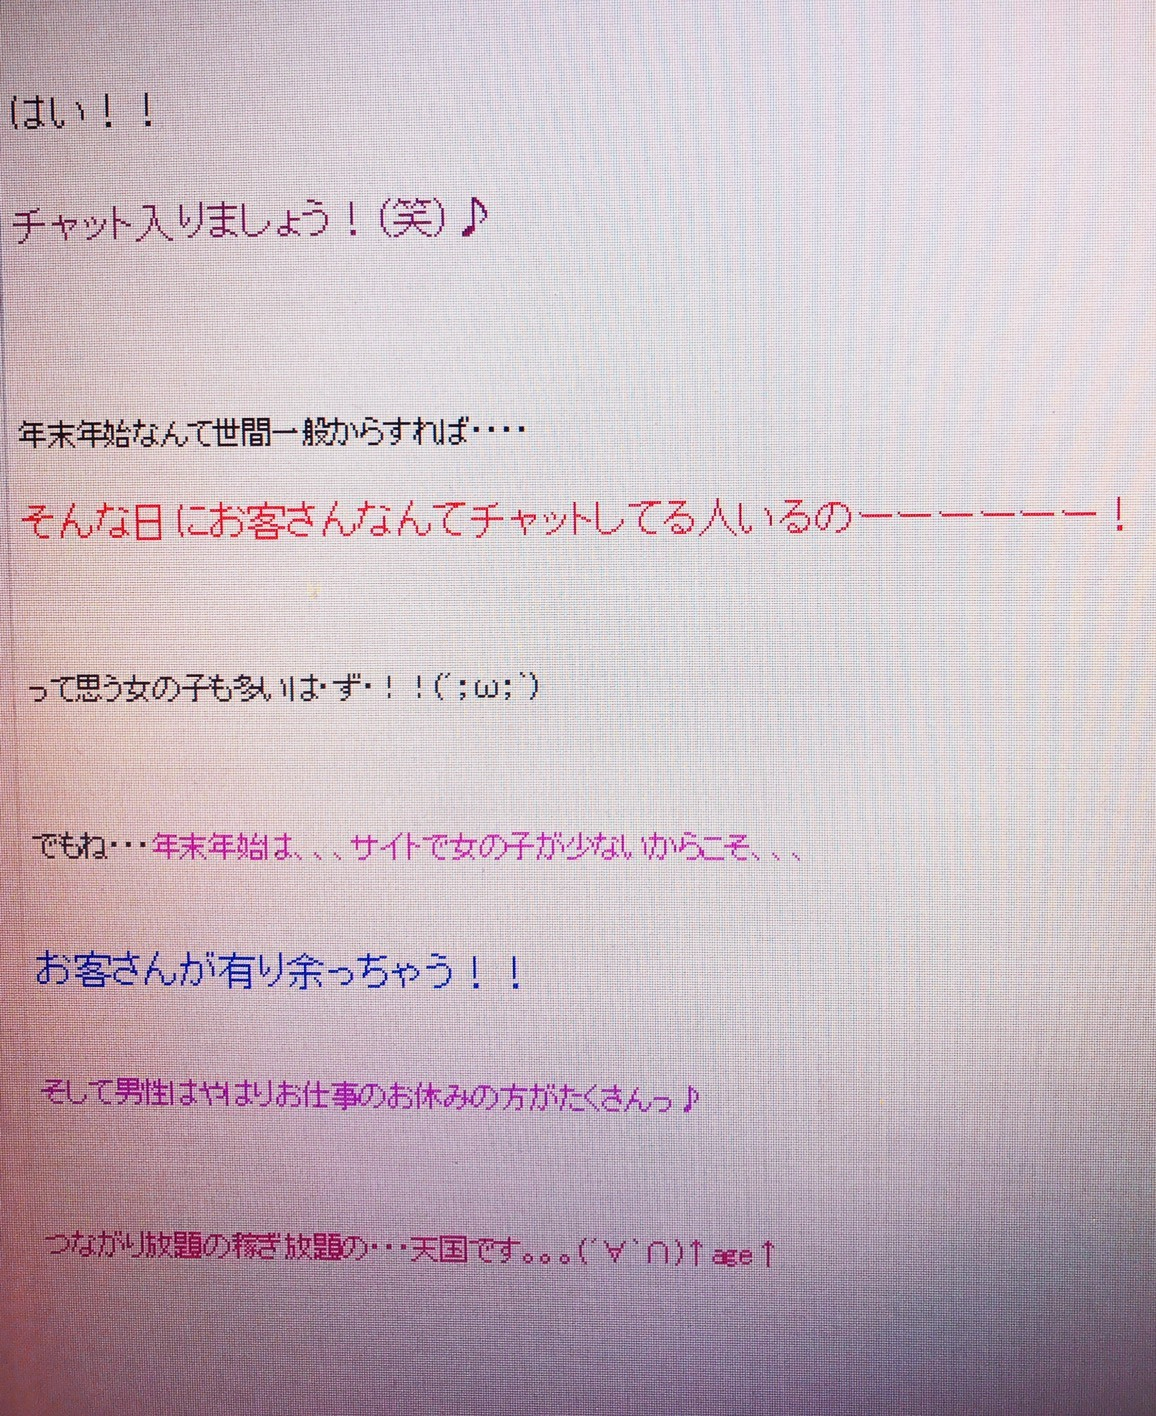 S__2580521.jpg